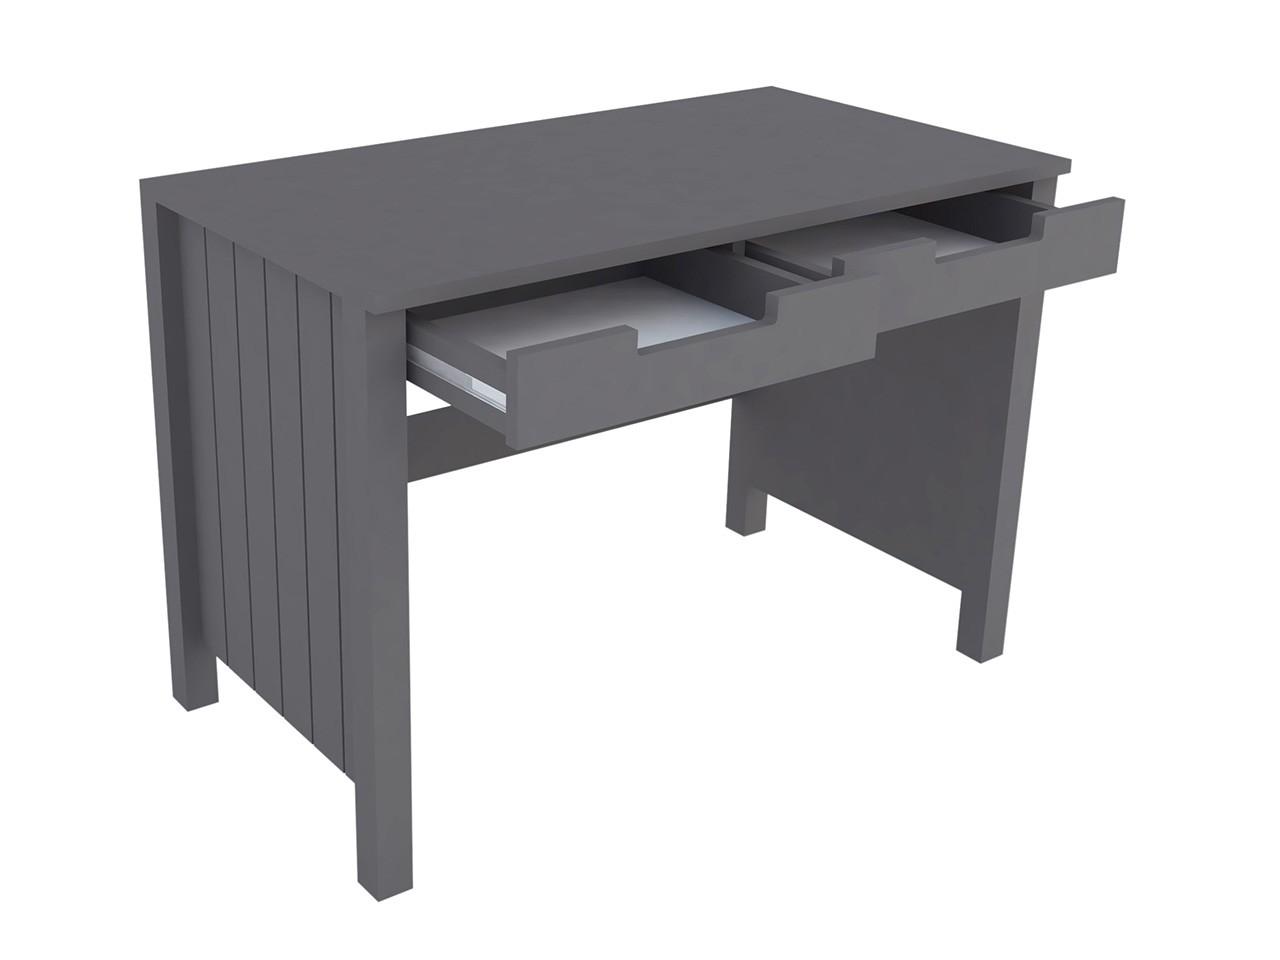 7558841b81b7 Detský písací stôl Tomi TO6 - Top-Nabytok24.sk